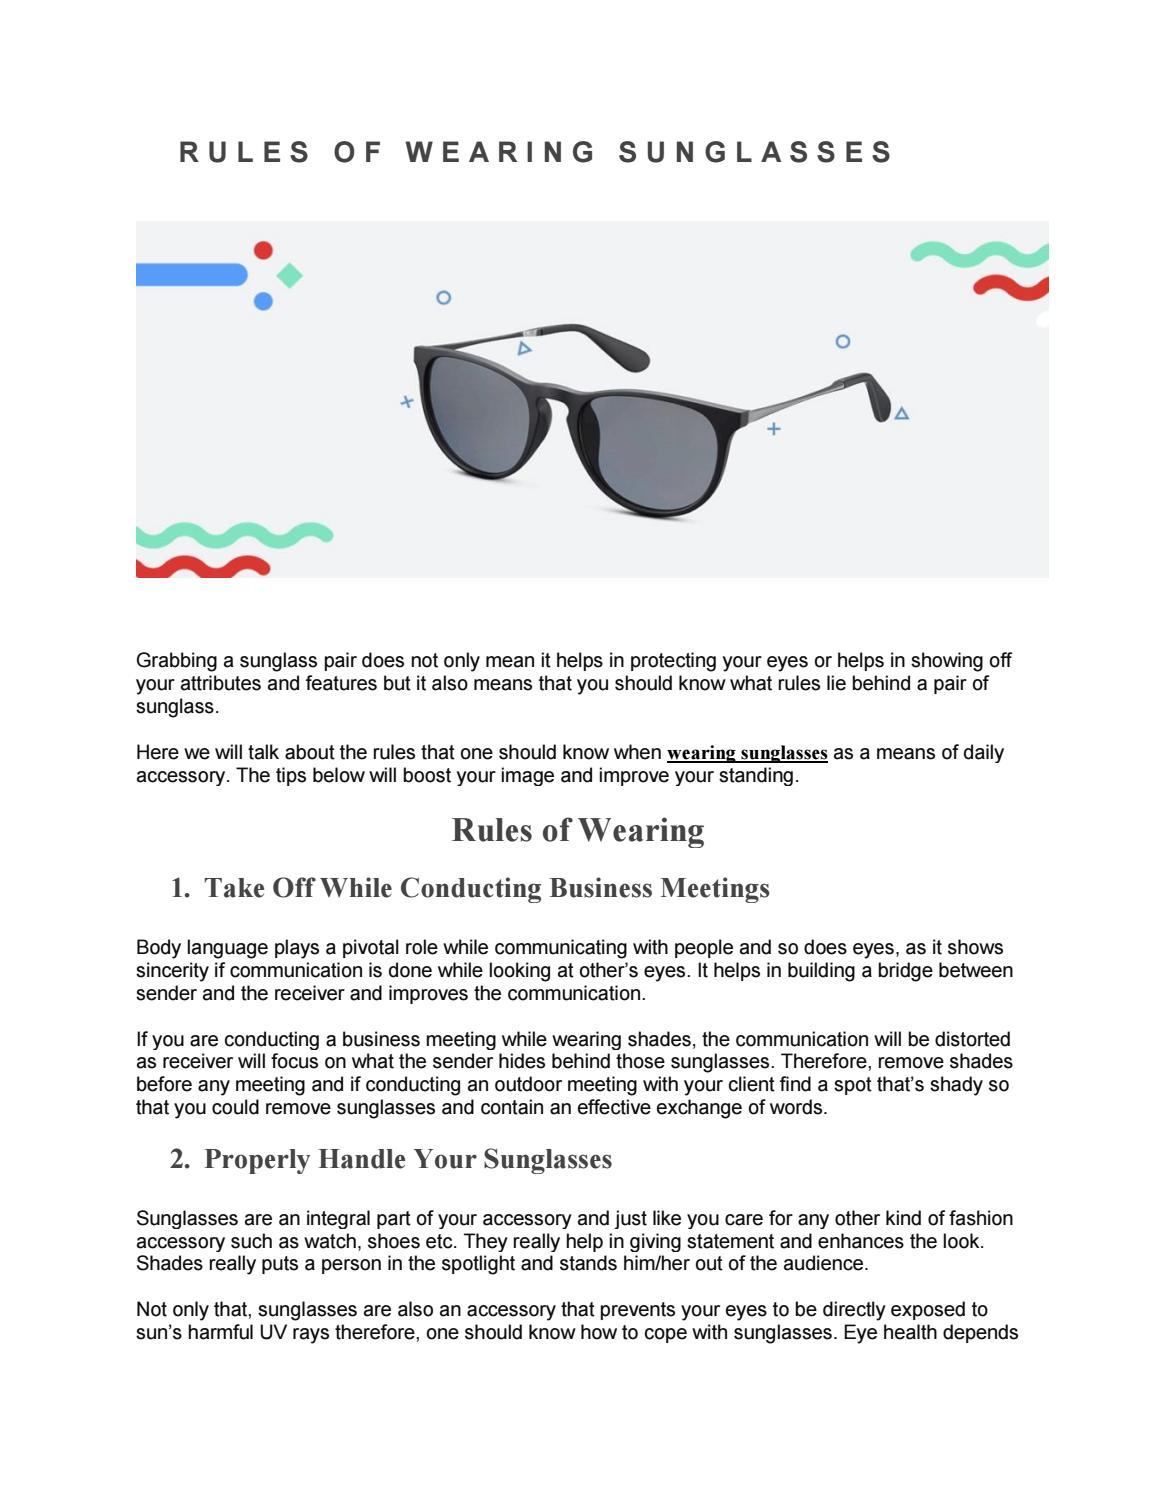 72eb66fc06a Rules of wearing sunglasses by Umair saleem - issuu